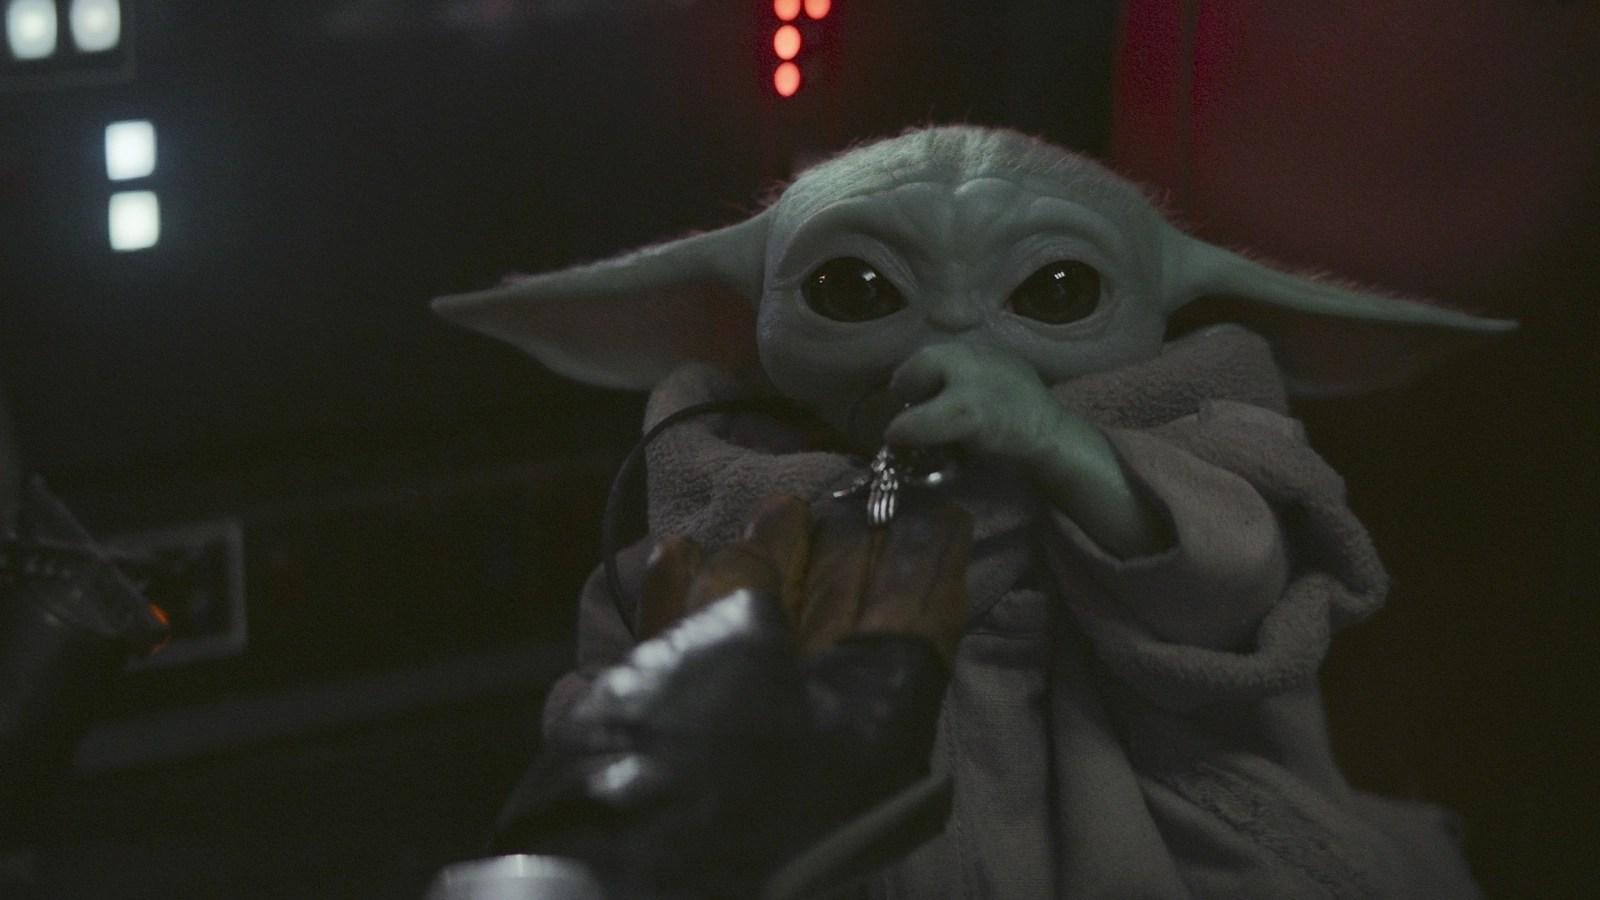 The Mandalorian Is The Baby Yoda The Reincarnation Of Yoda Igamesnews